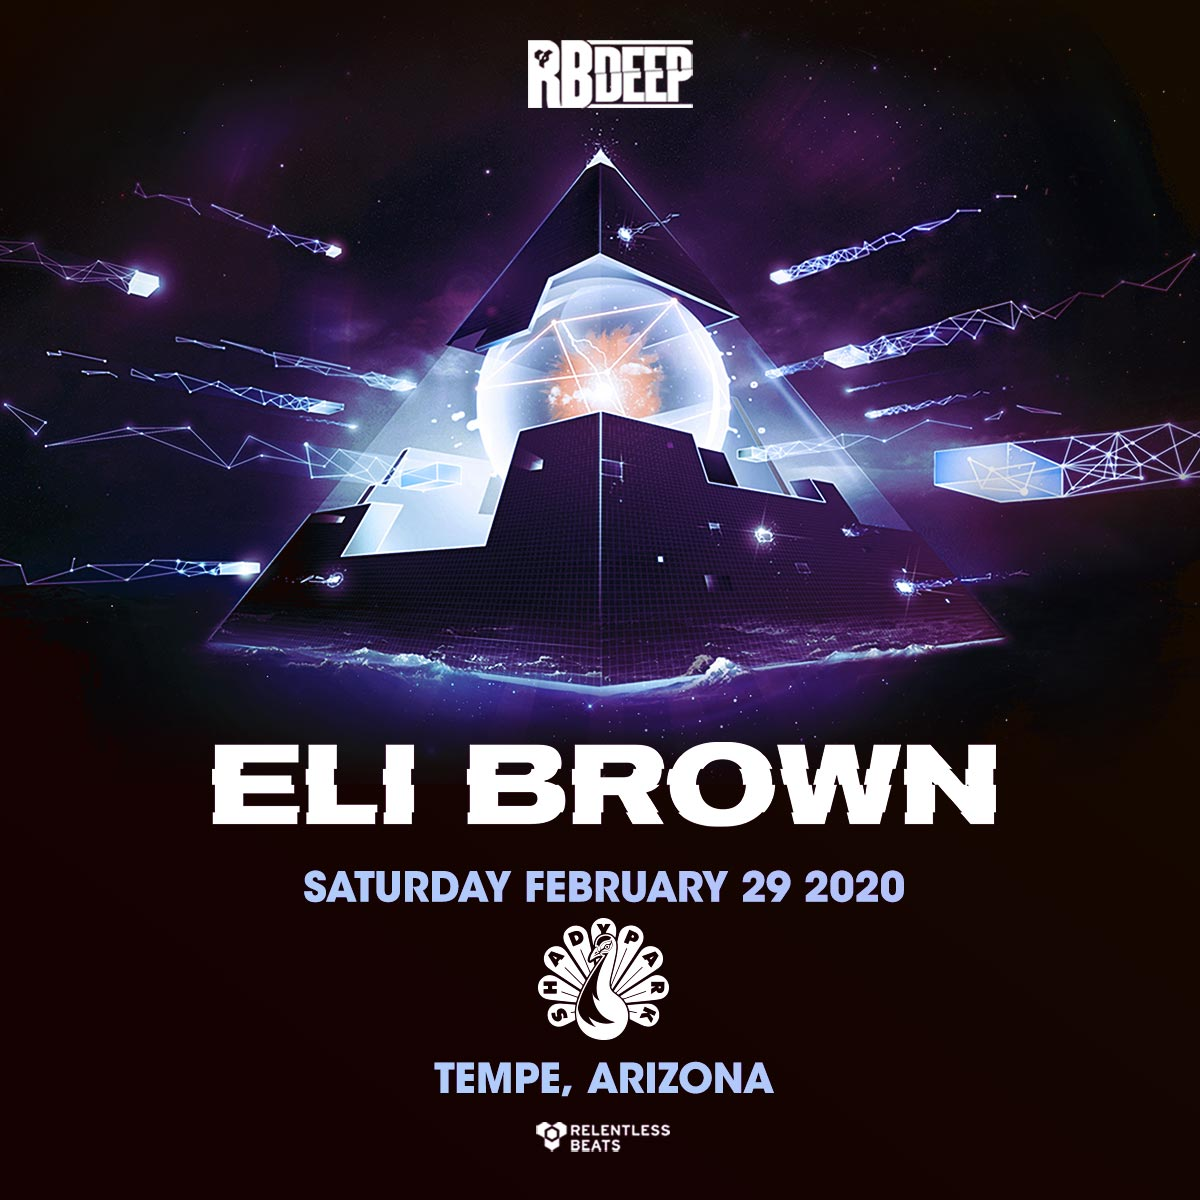 Flyer for Eli Brown